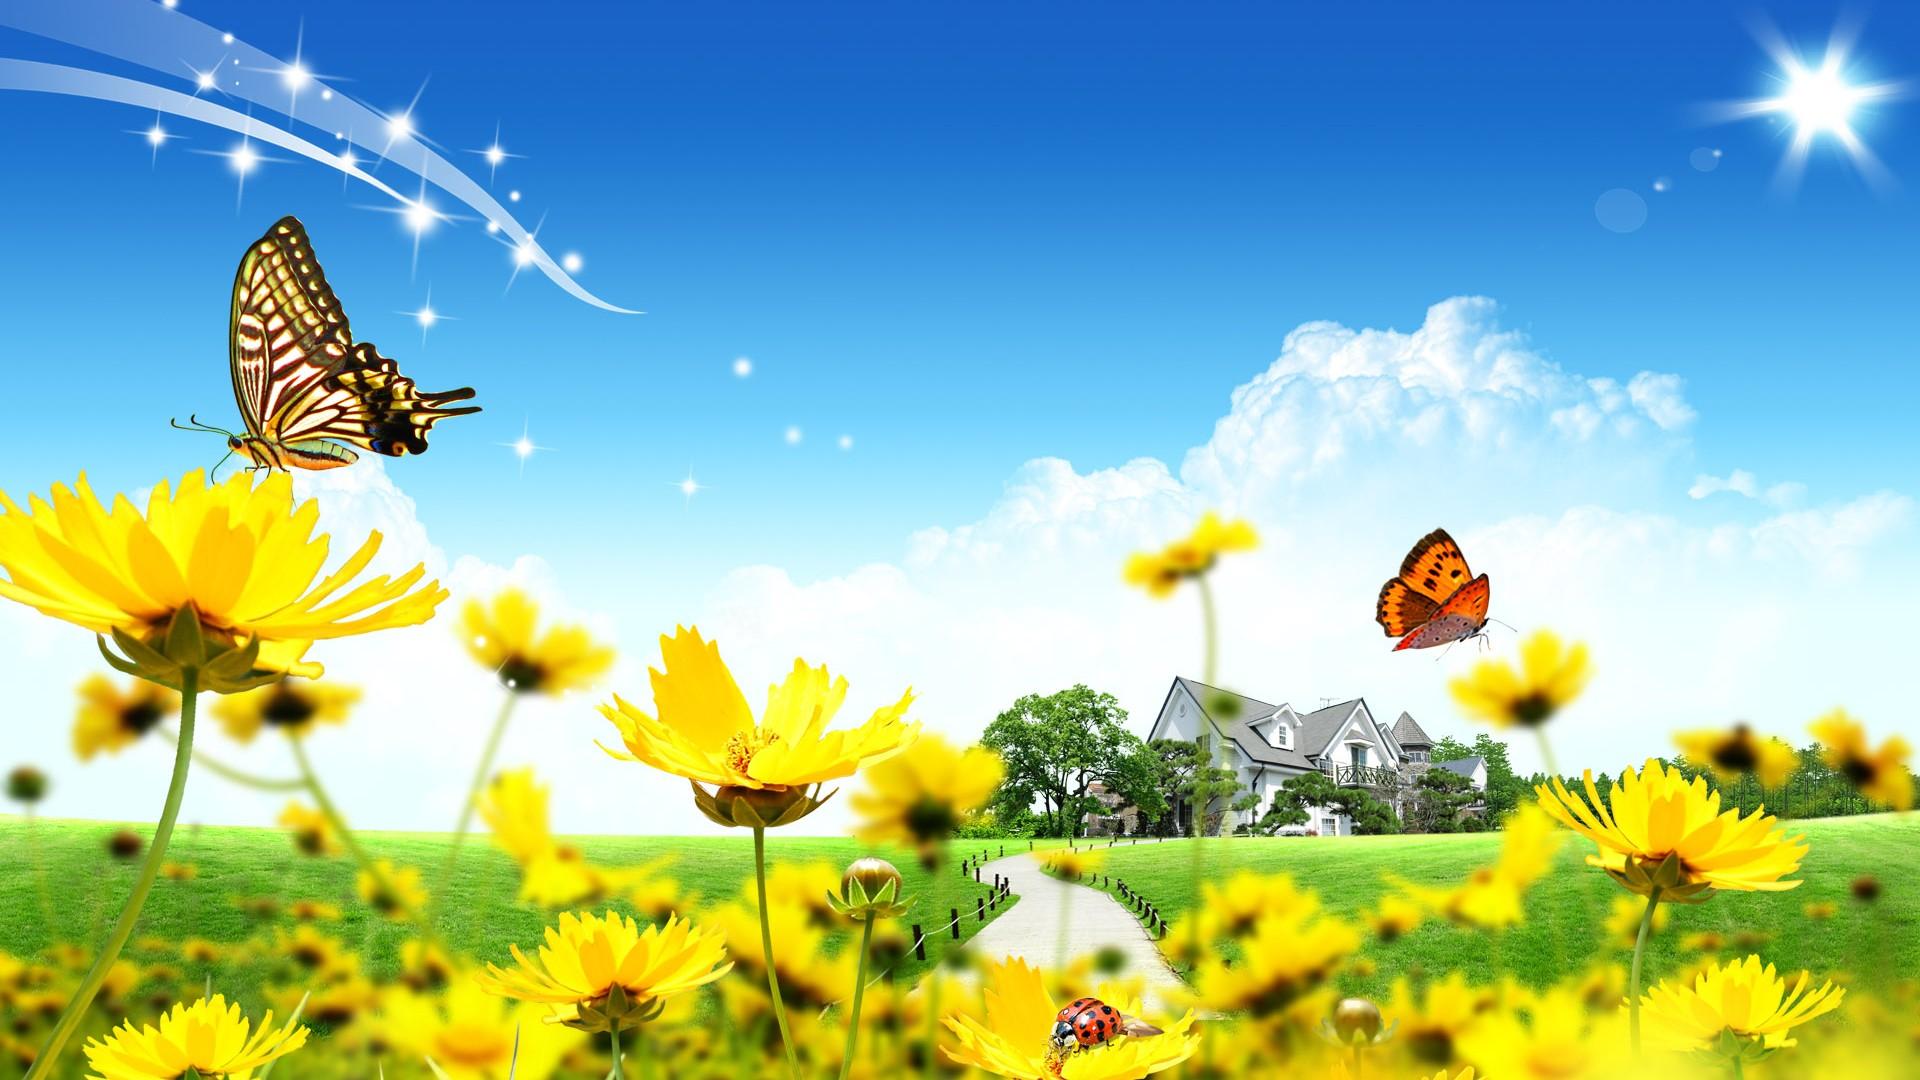 49 Windows Wallpaper Spring Themes On Wallpapersafari